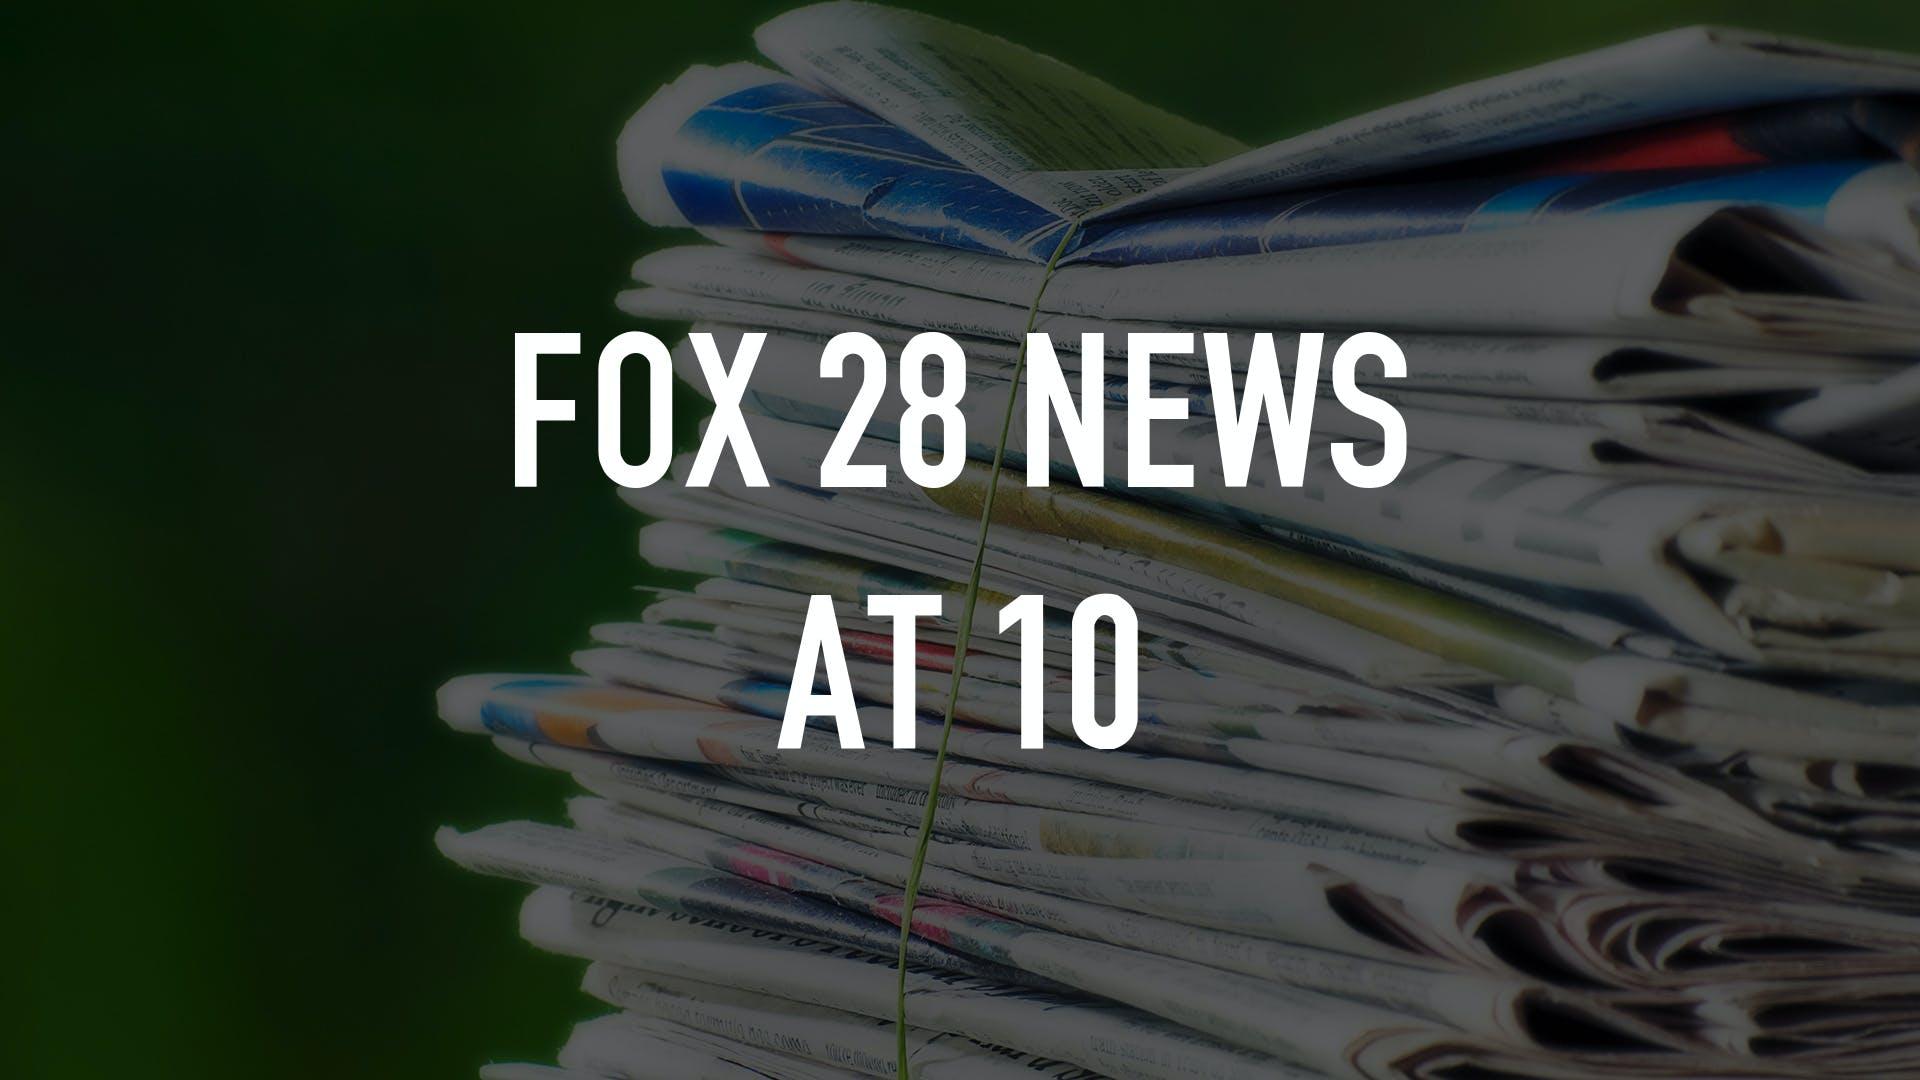 Watch FOX 28 News at 10 | Stream on fuboTV (Free Trial)